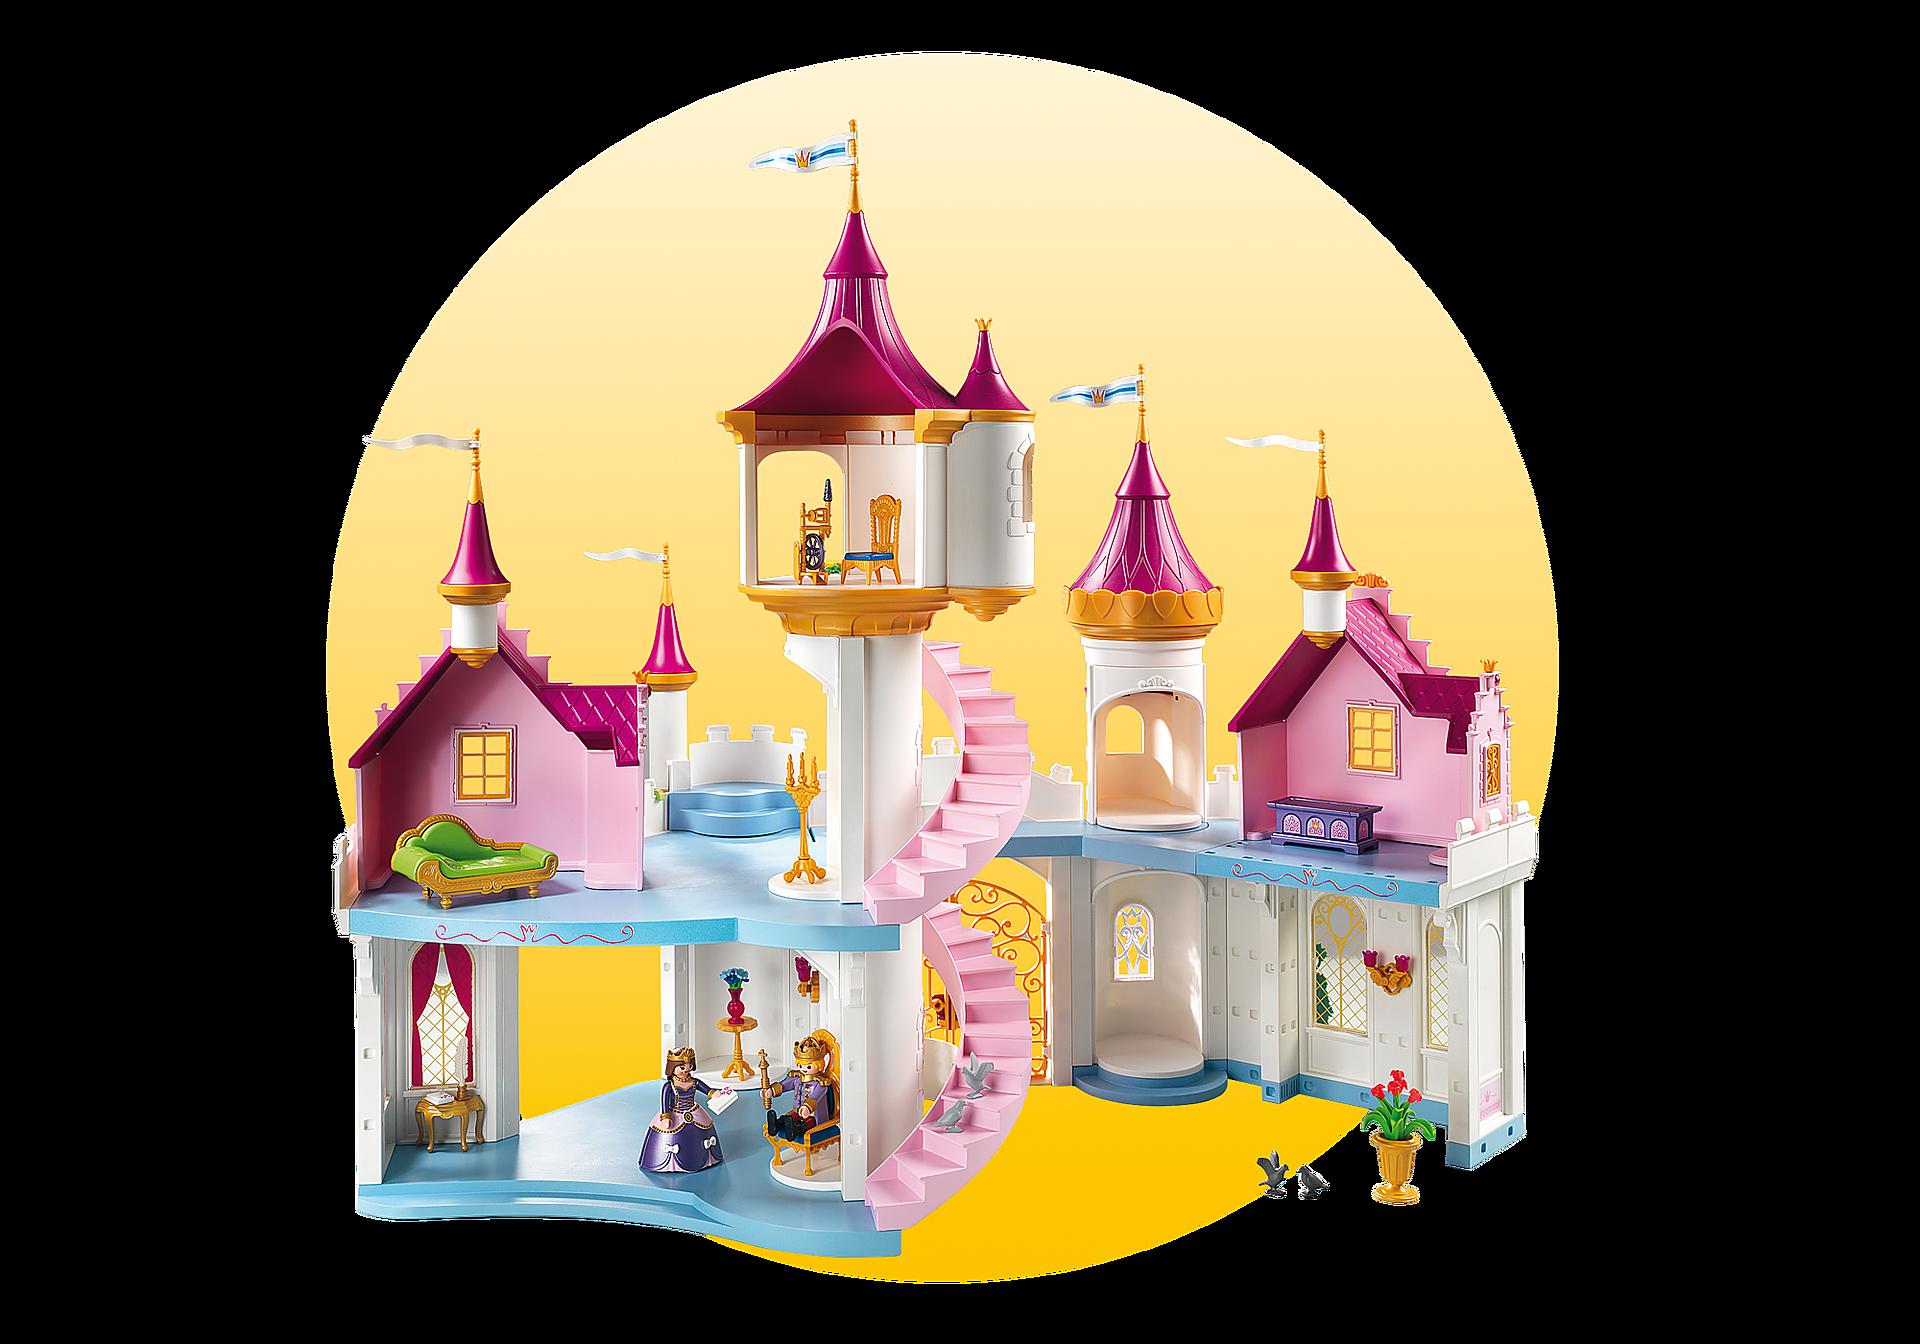 http://media.playmobil.com/i/playmobil/6848_product_extra4/Замок Принцессы: Большой Замок Принцессы